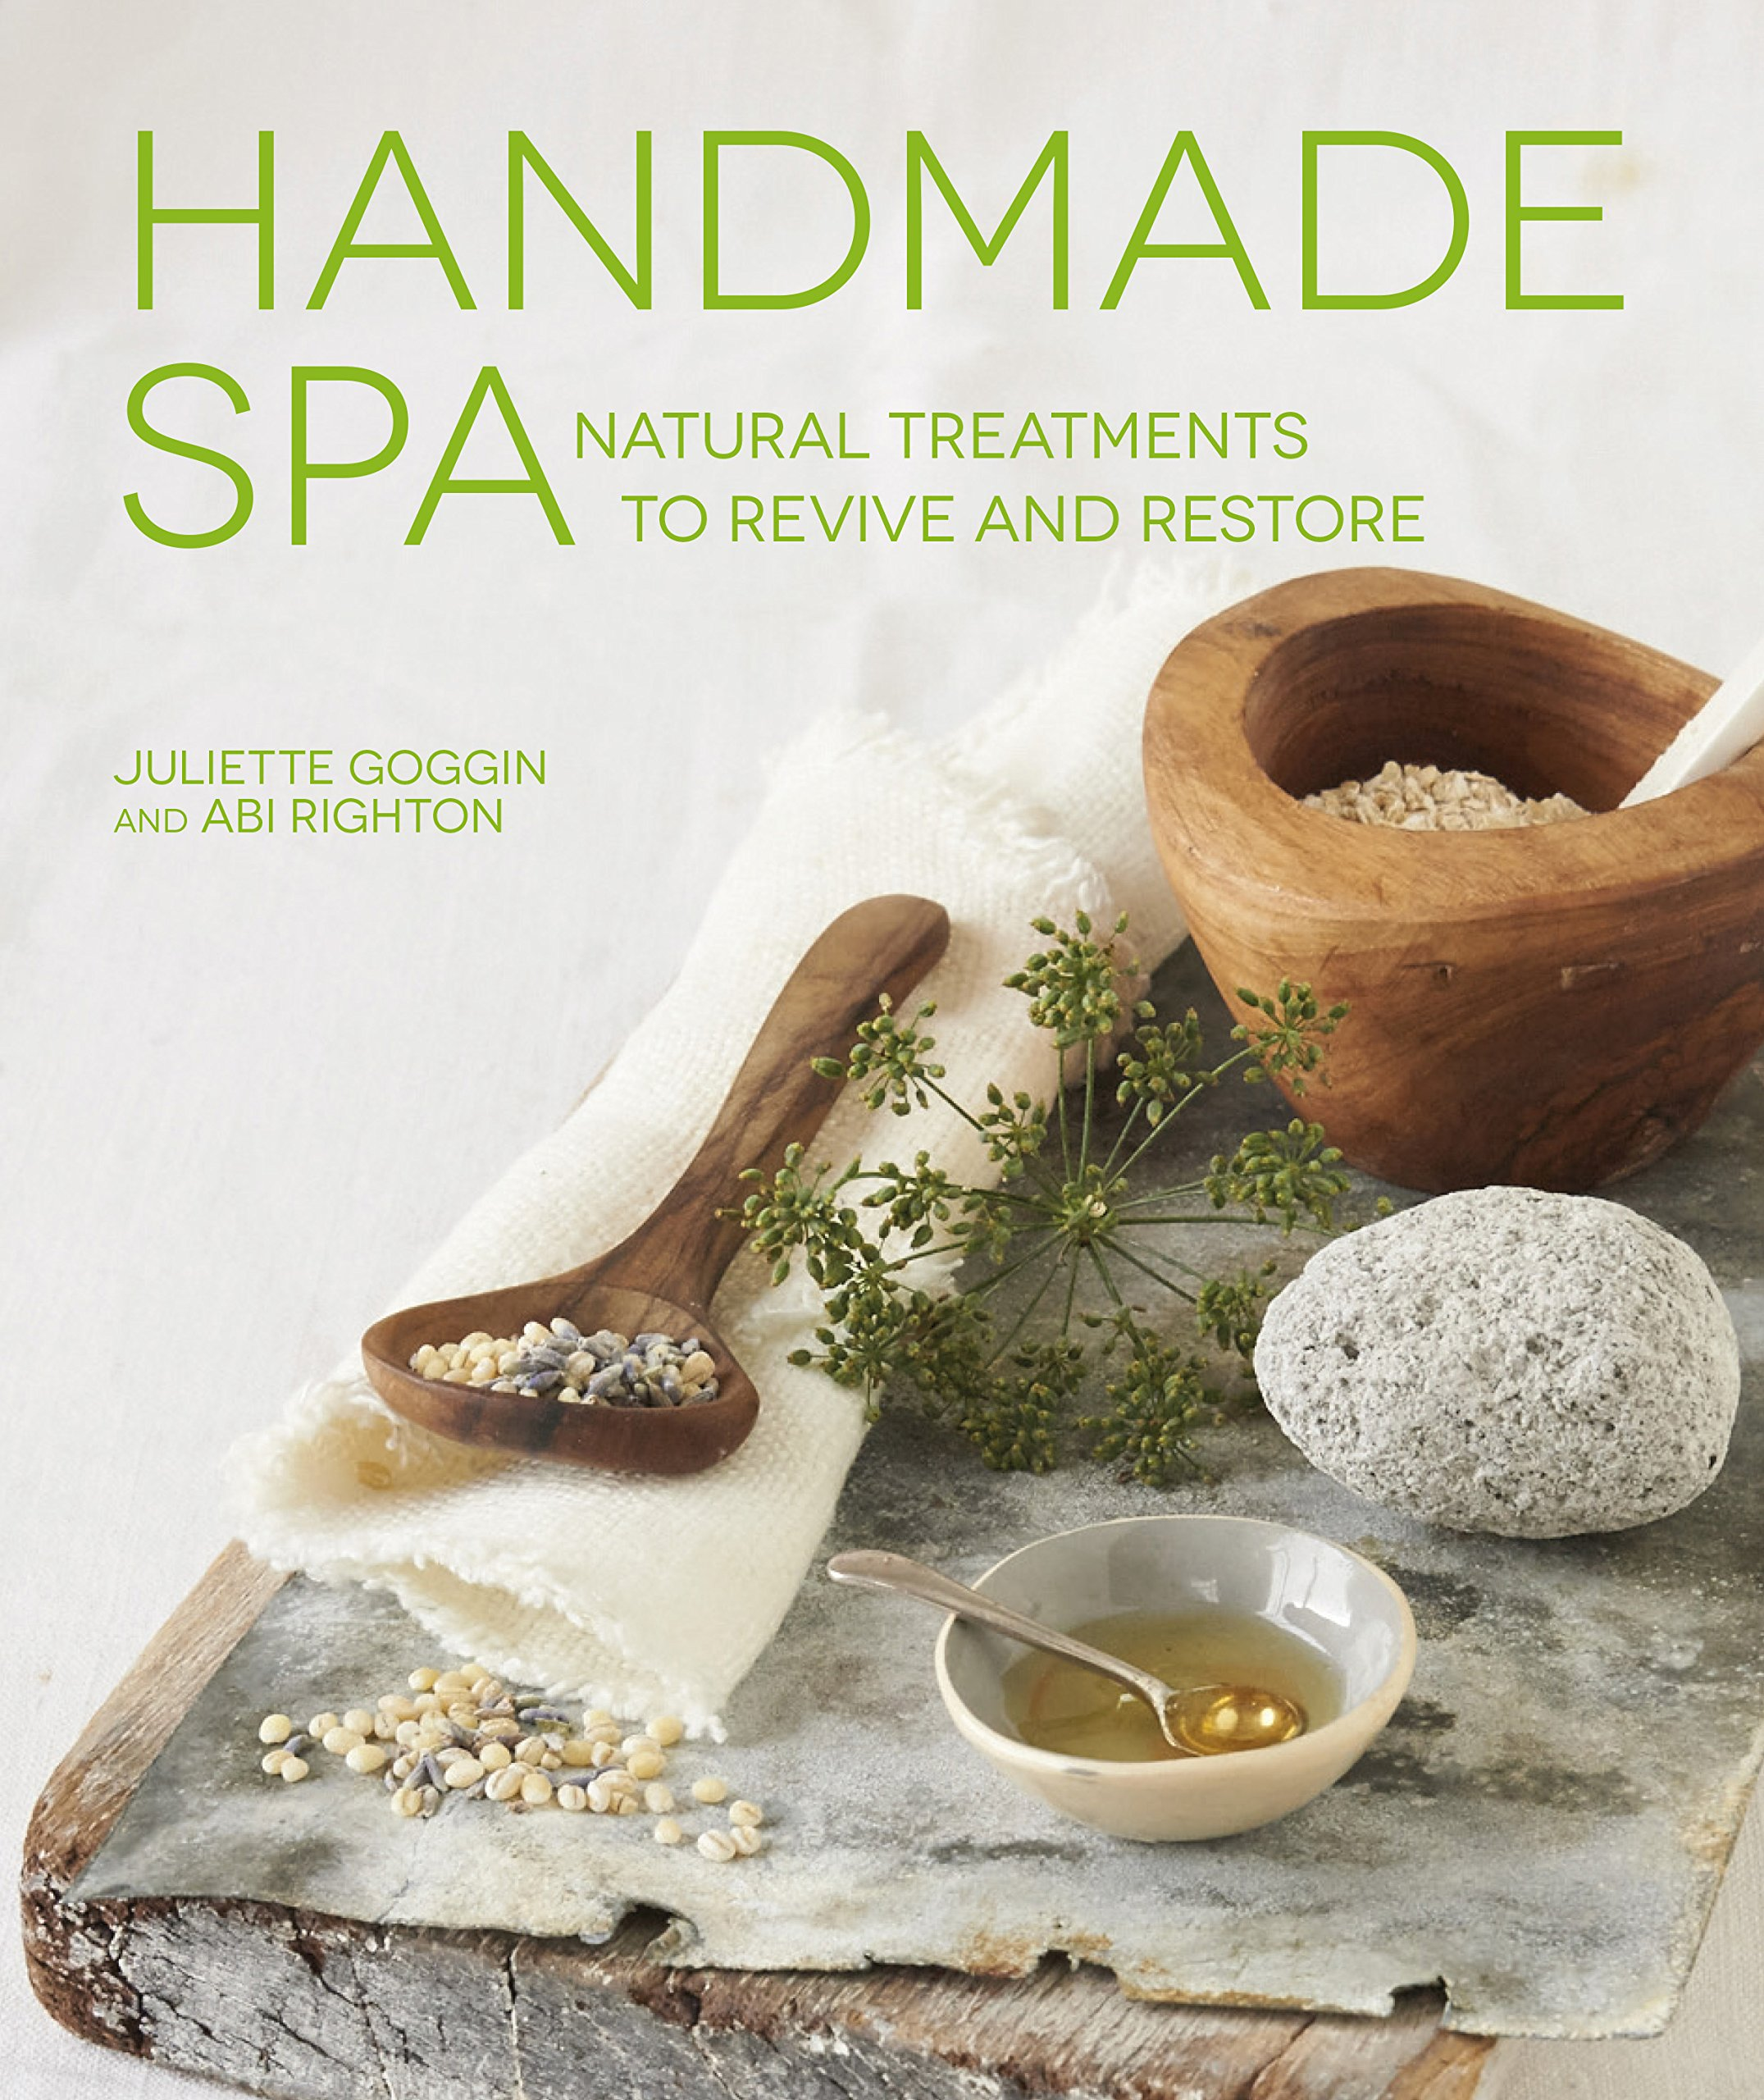 Handmade Spa Natural Treatments Restore product image